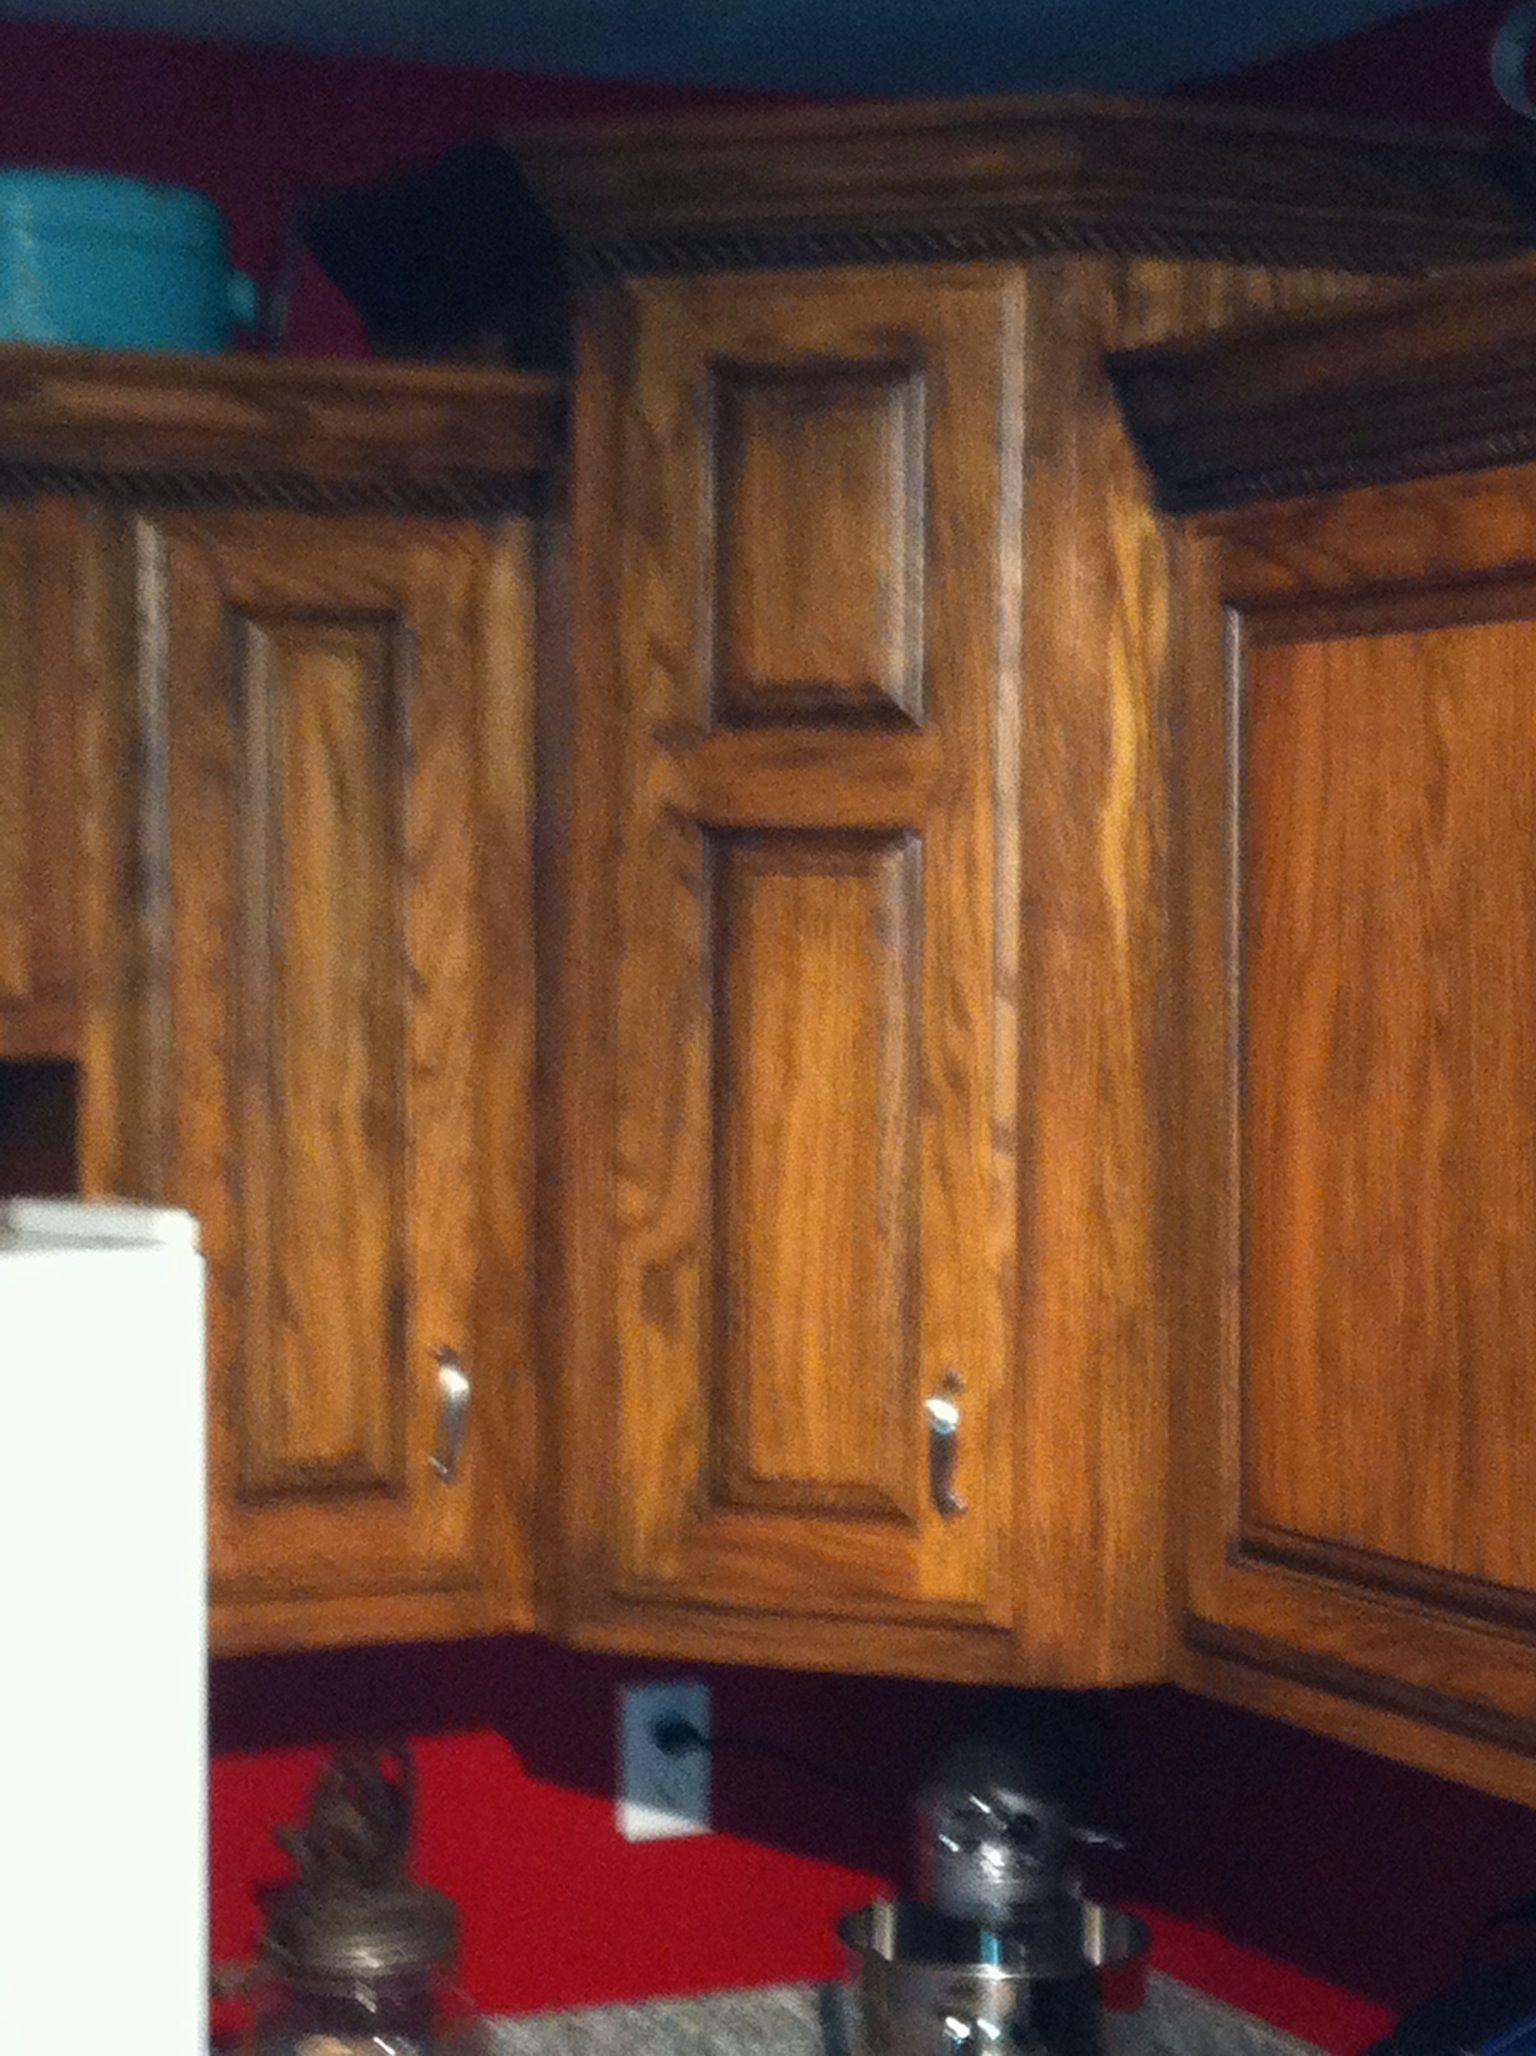 Update Oak Cabinets My Golden Oak Cabinet Kitchen Remodel Darkened With Glaze And